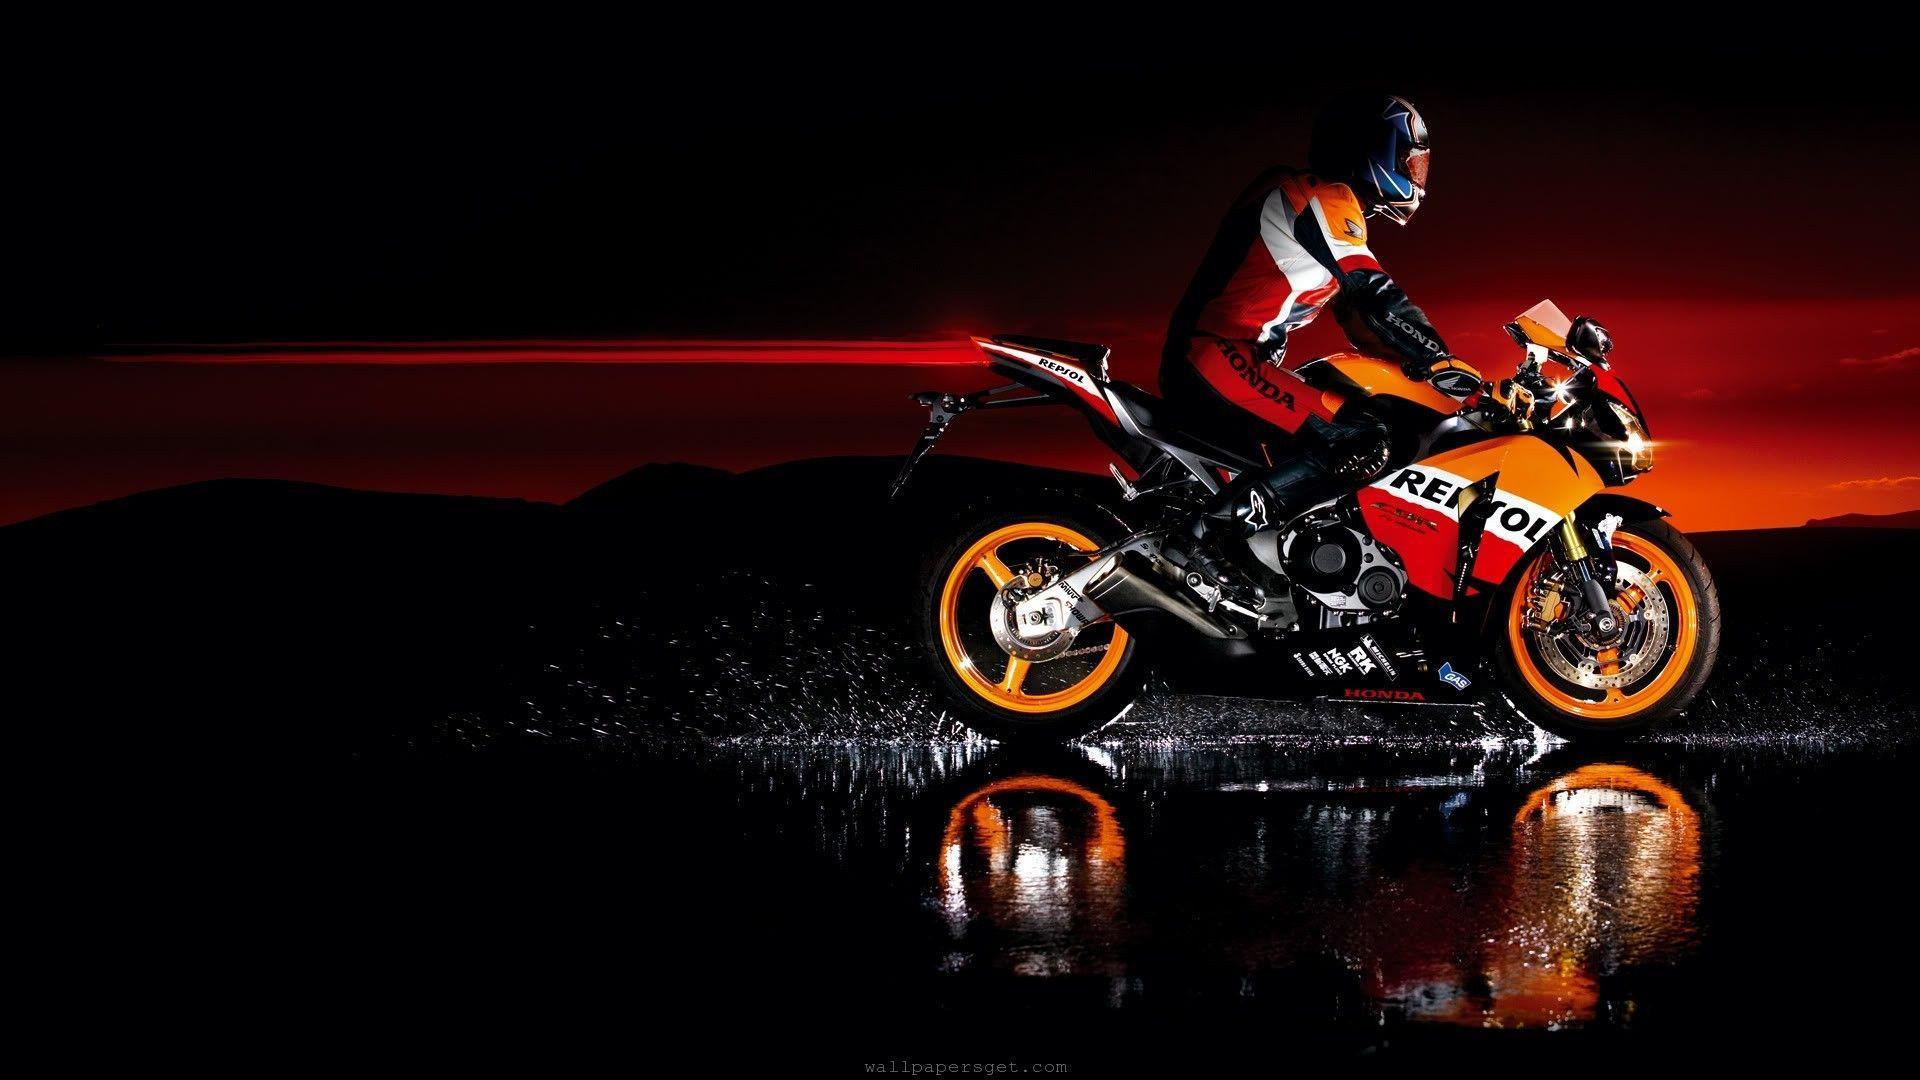 Motorcycle Desktop Wallpapers Top Free Motorcycle Desktop Backgrounds Wallpaperaccess